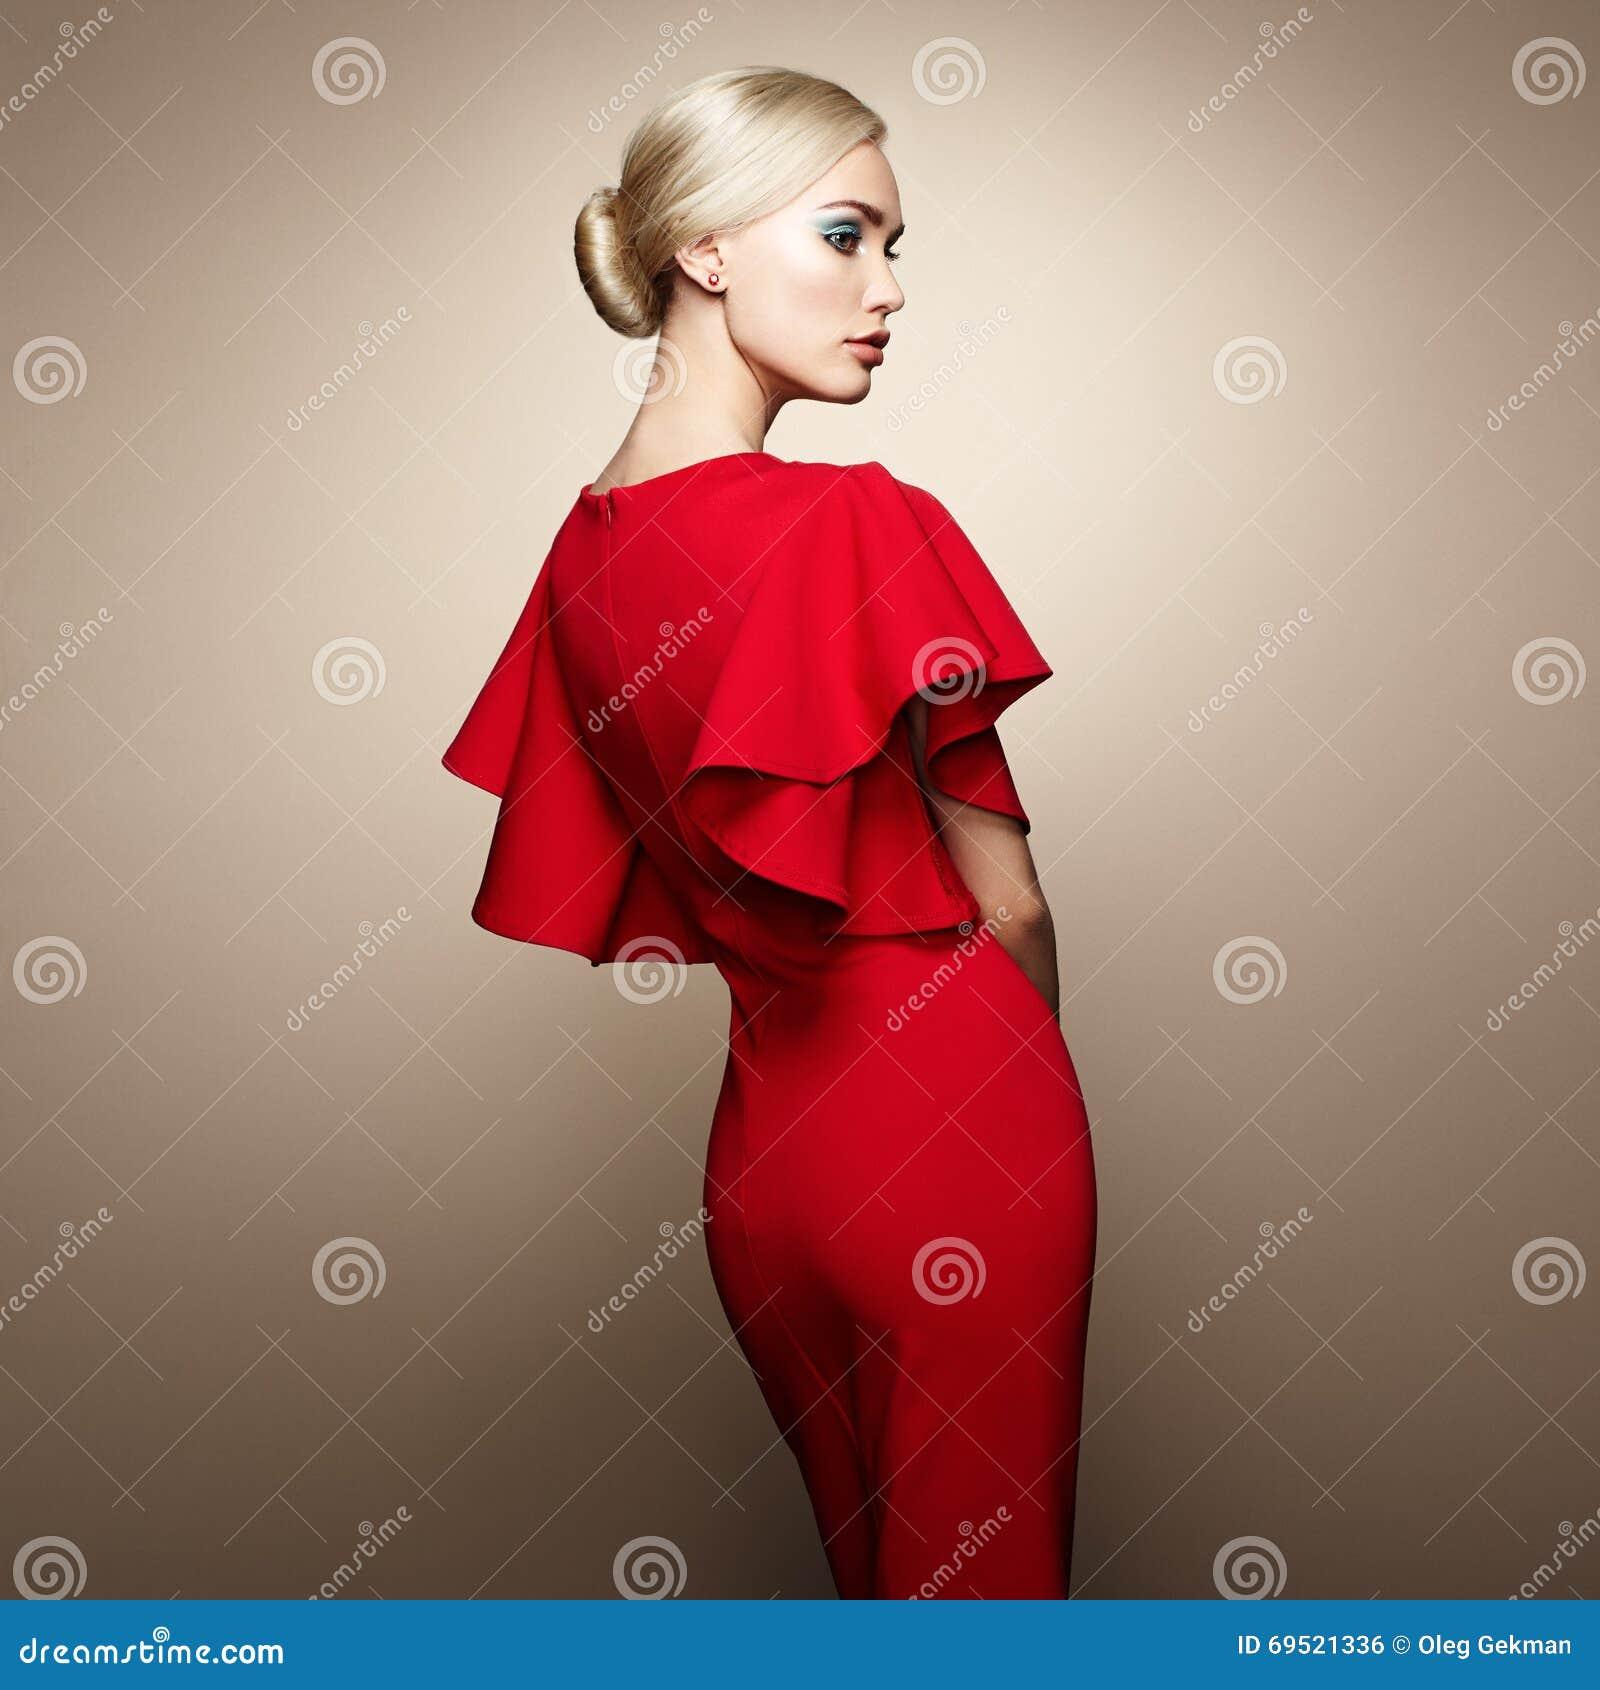 Red dress elegant girls